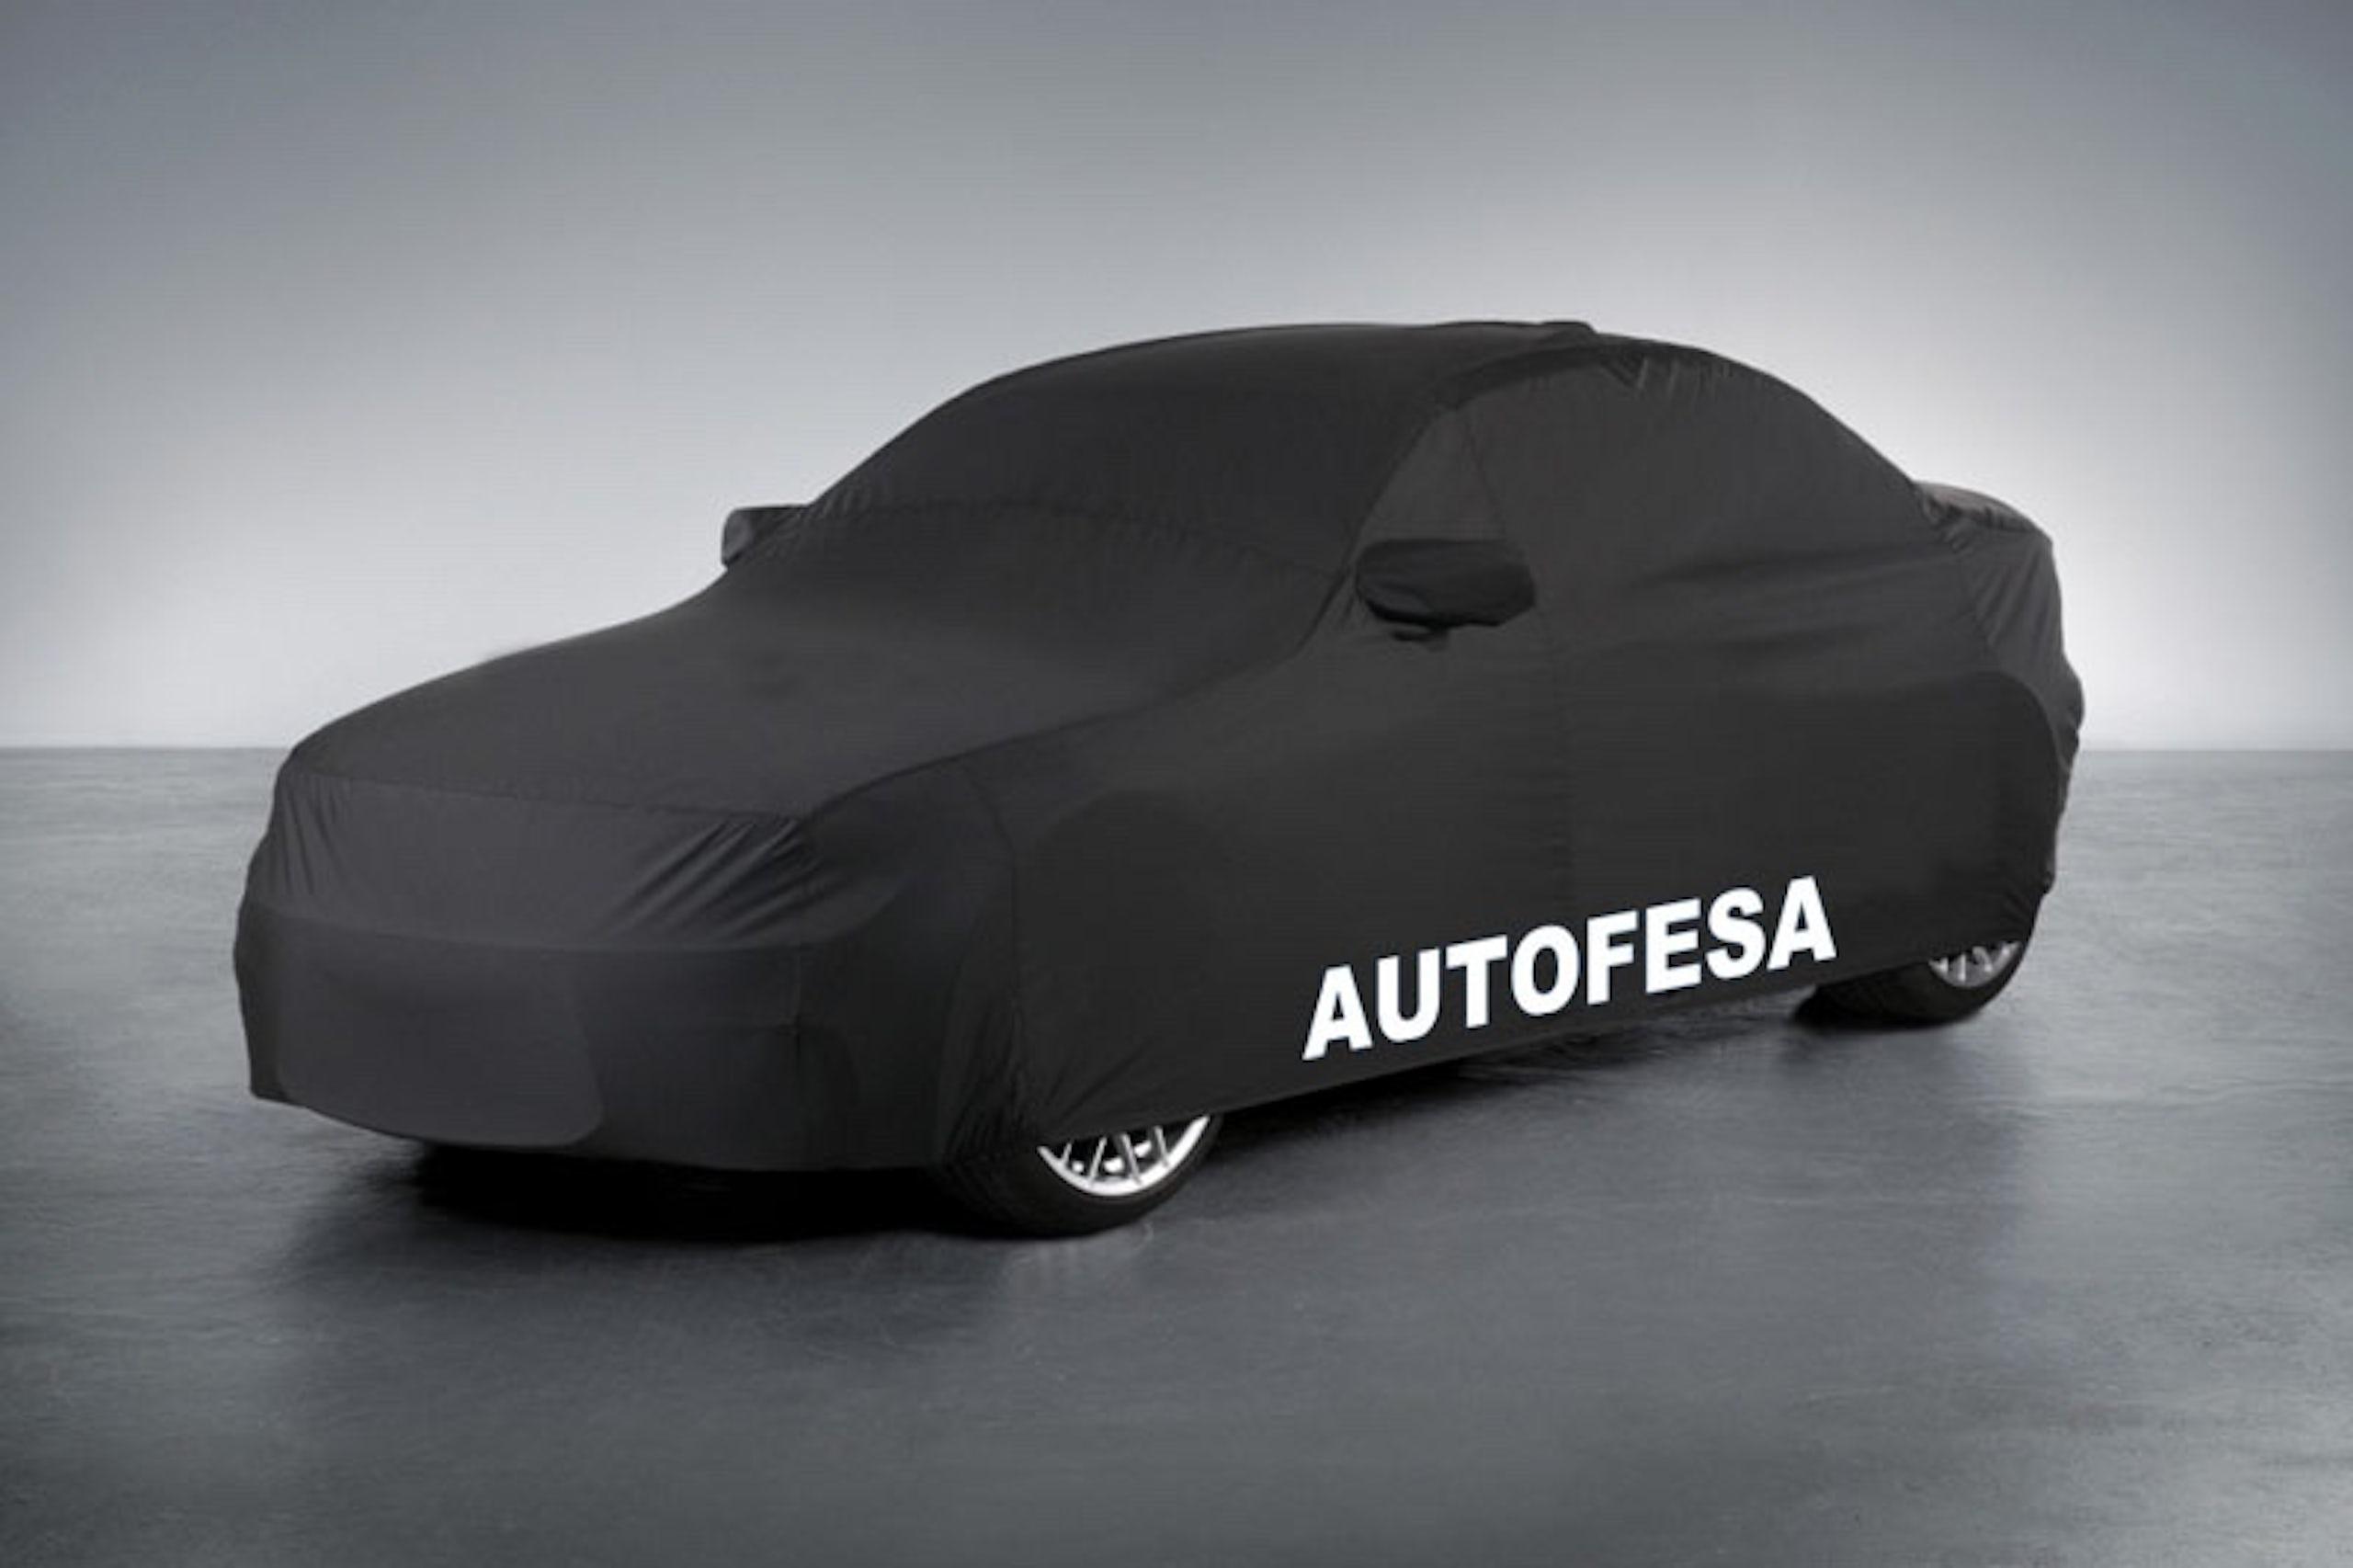 Ford Mondeo 2.0 TDCi 150cv Trend 5p Powershift Auto S/S - Foto 25